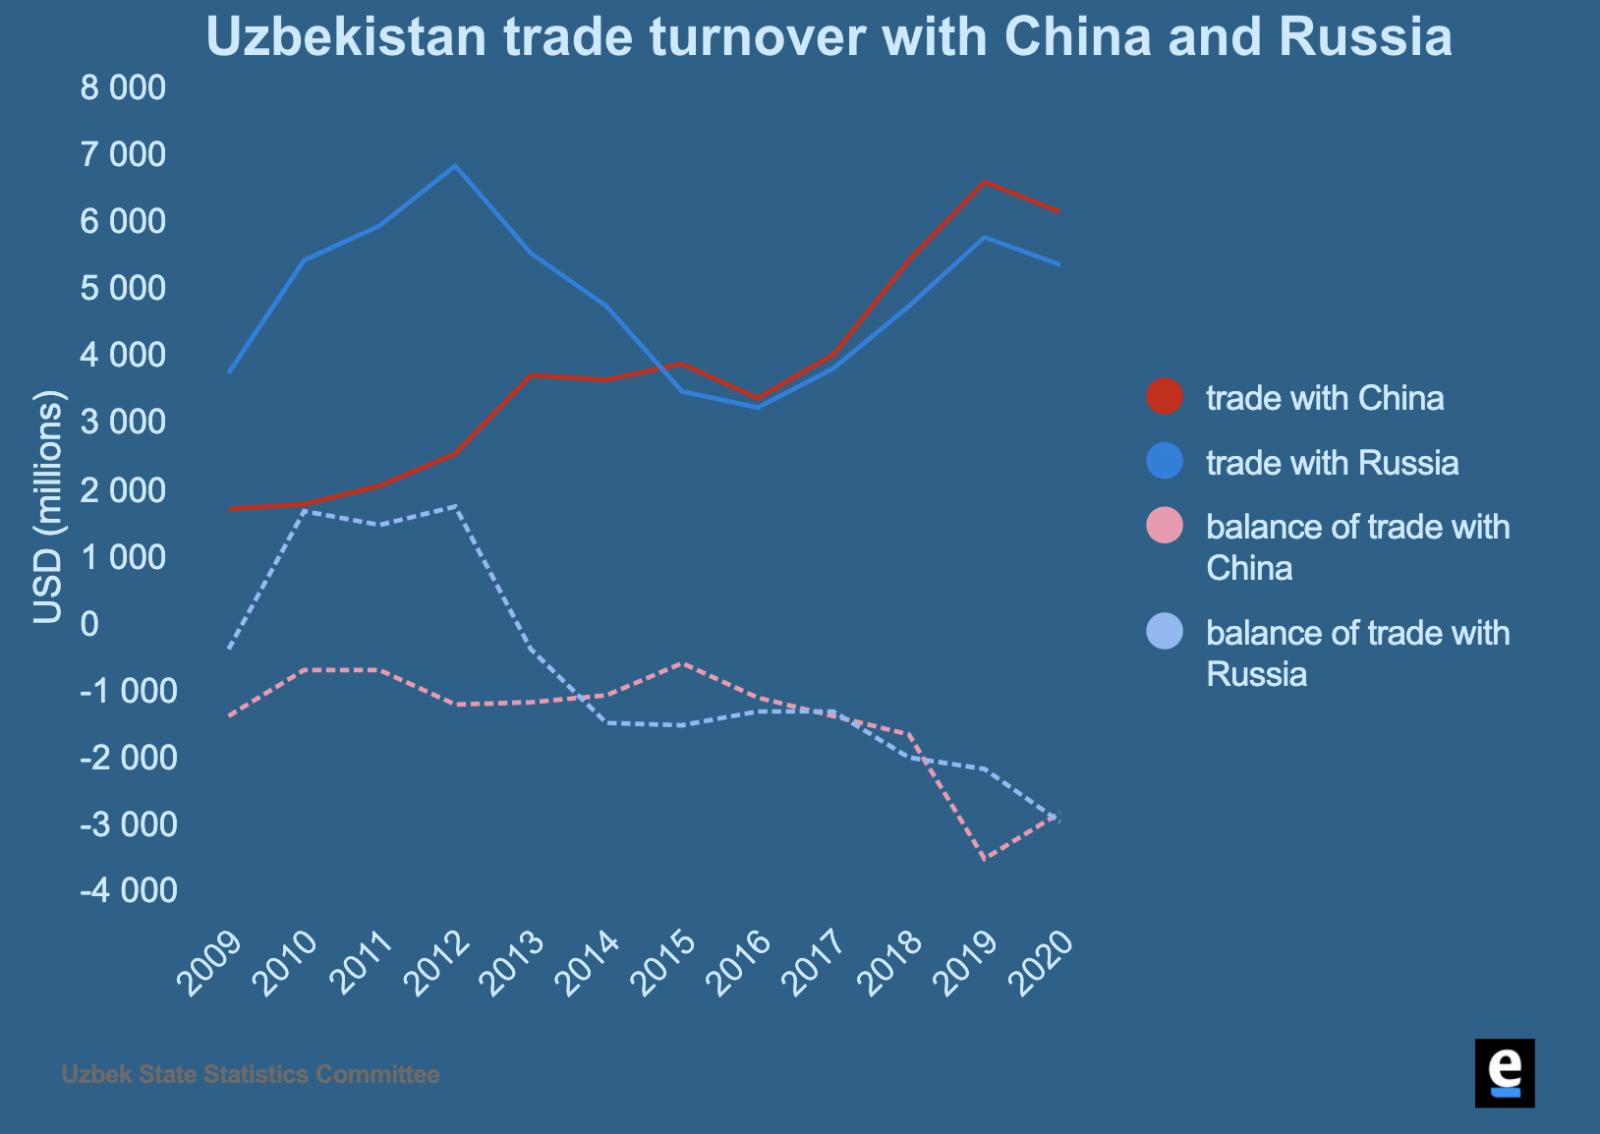 Despite Drop, China Maintains Edge as Uzbekistan's Top Trade Partner